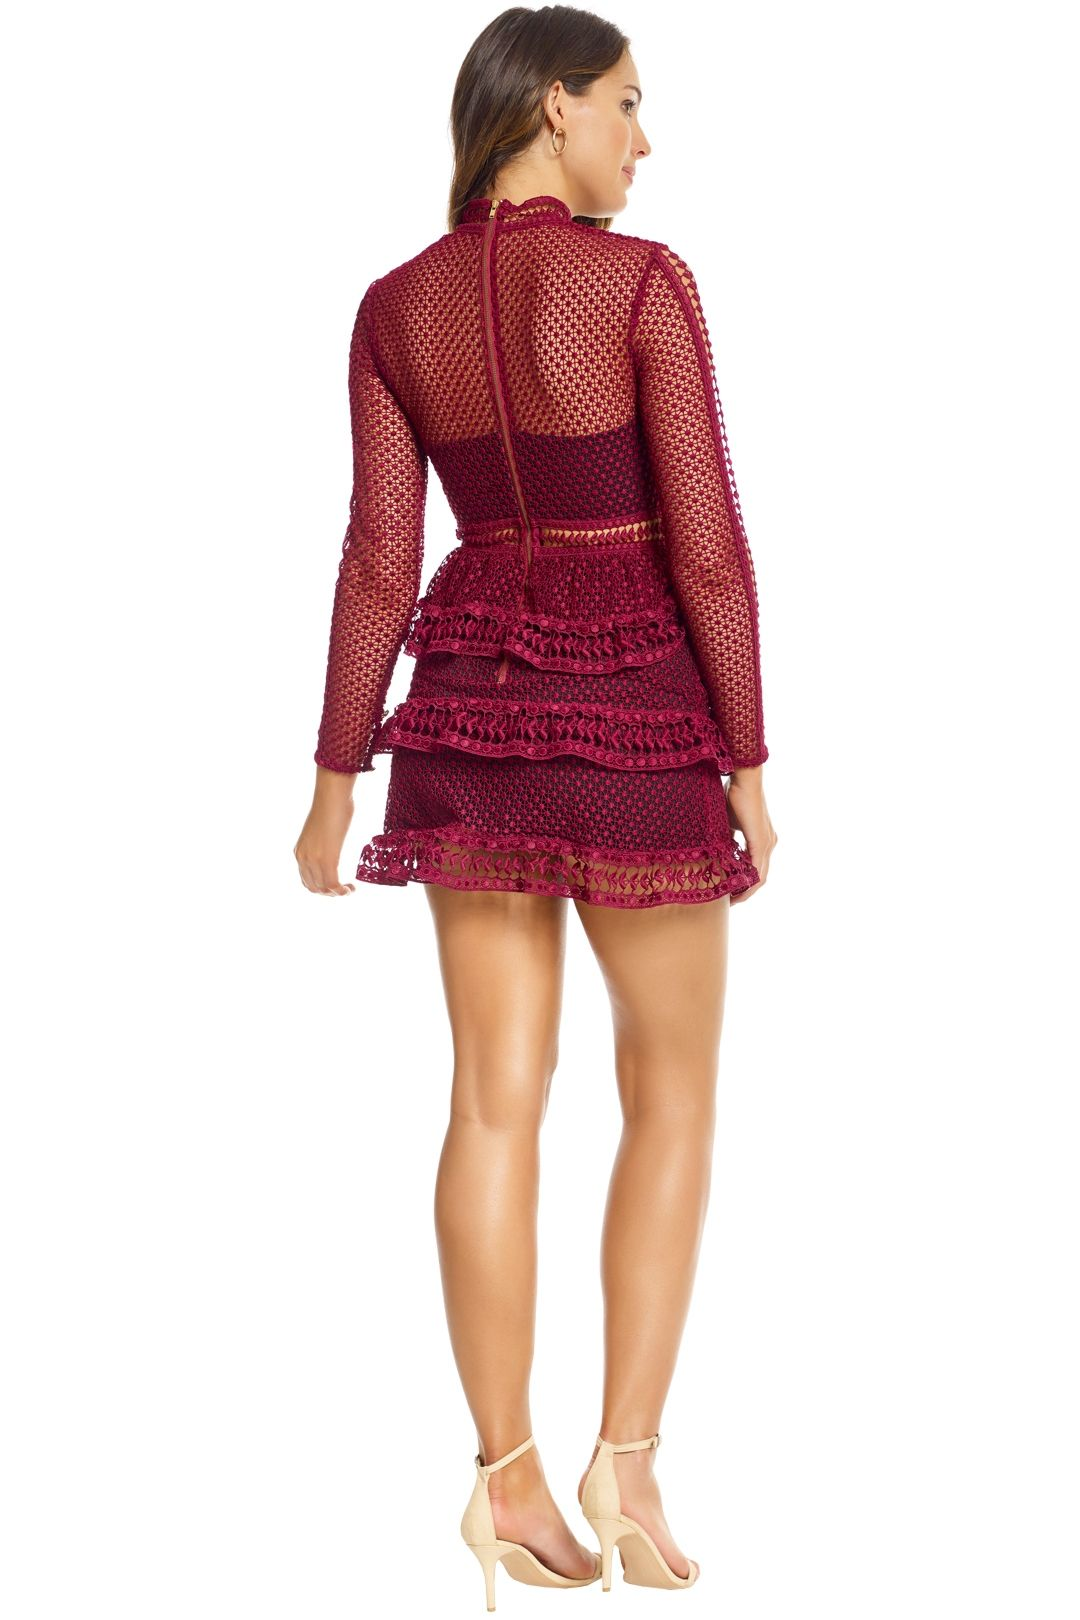 Self Portrait - Tiered Guipure Lace Mini Dress - Maroon - Back